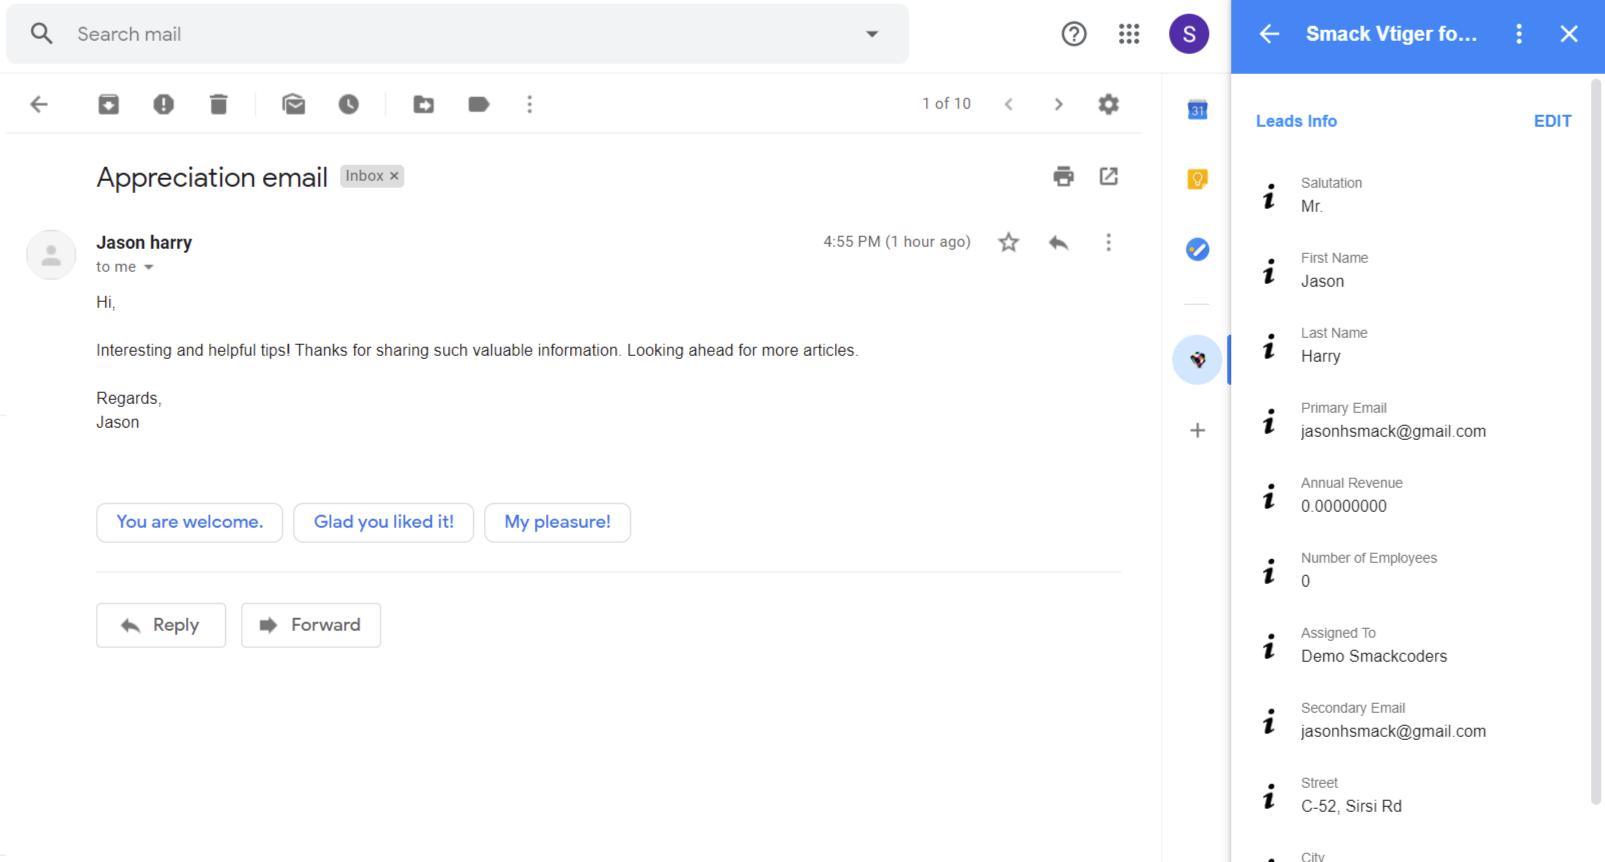 vtiger-gmail-addon-record-detailed-view